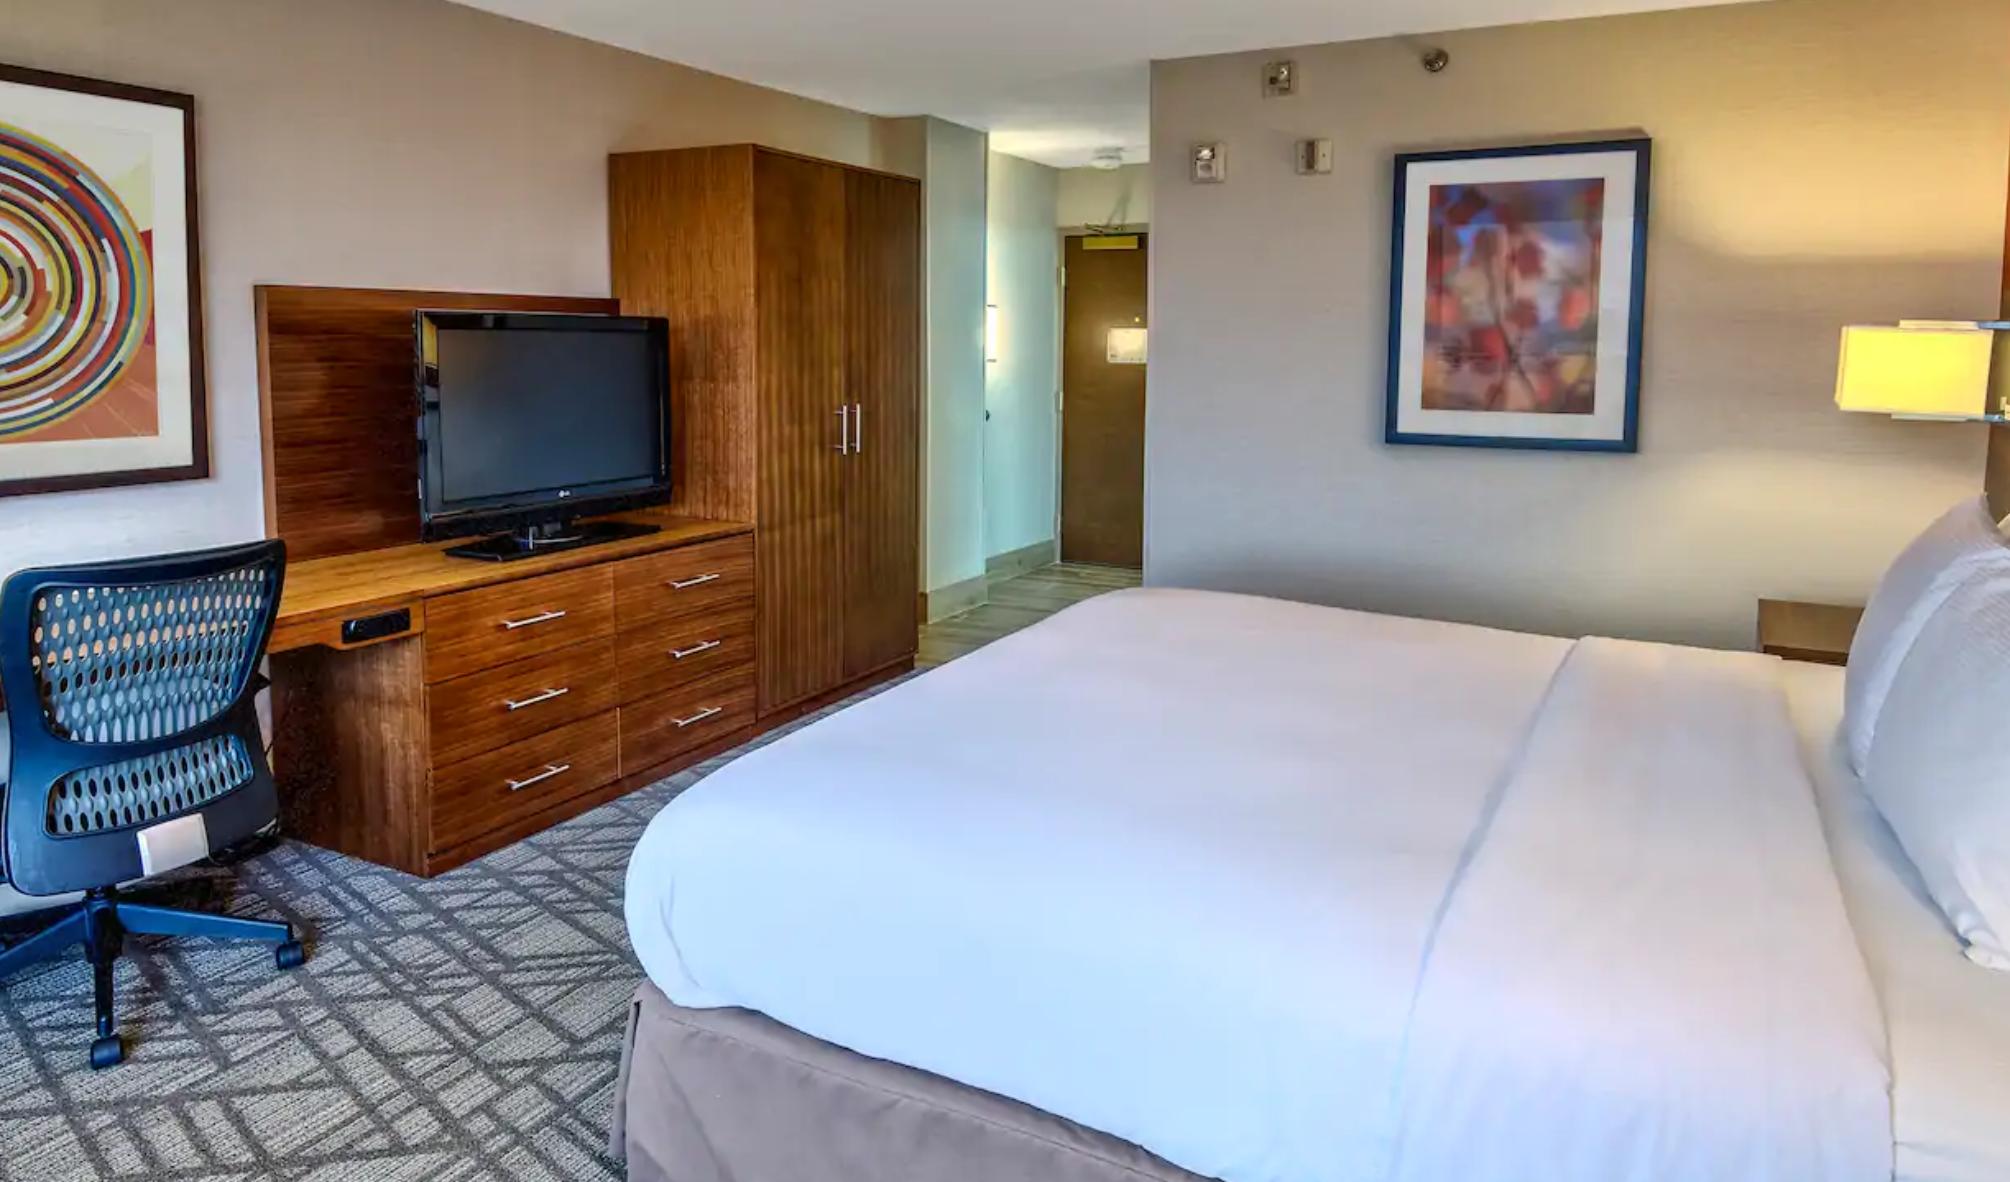 https://www.hotelsbyday.com/_data/default-hotel_image/3/19237/screenshot-2020-06-29-at-11-54-55-am.png